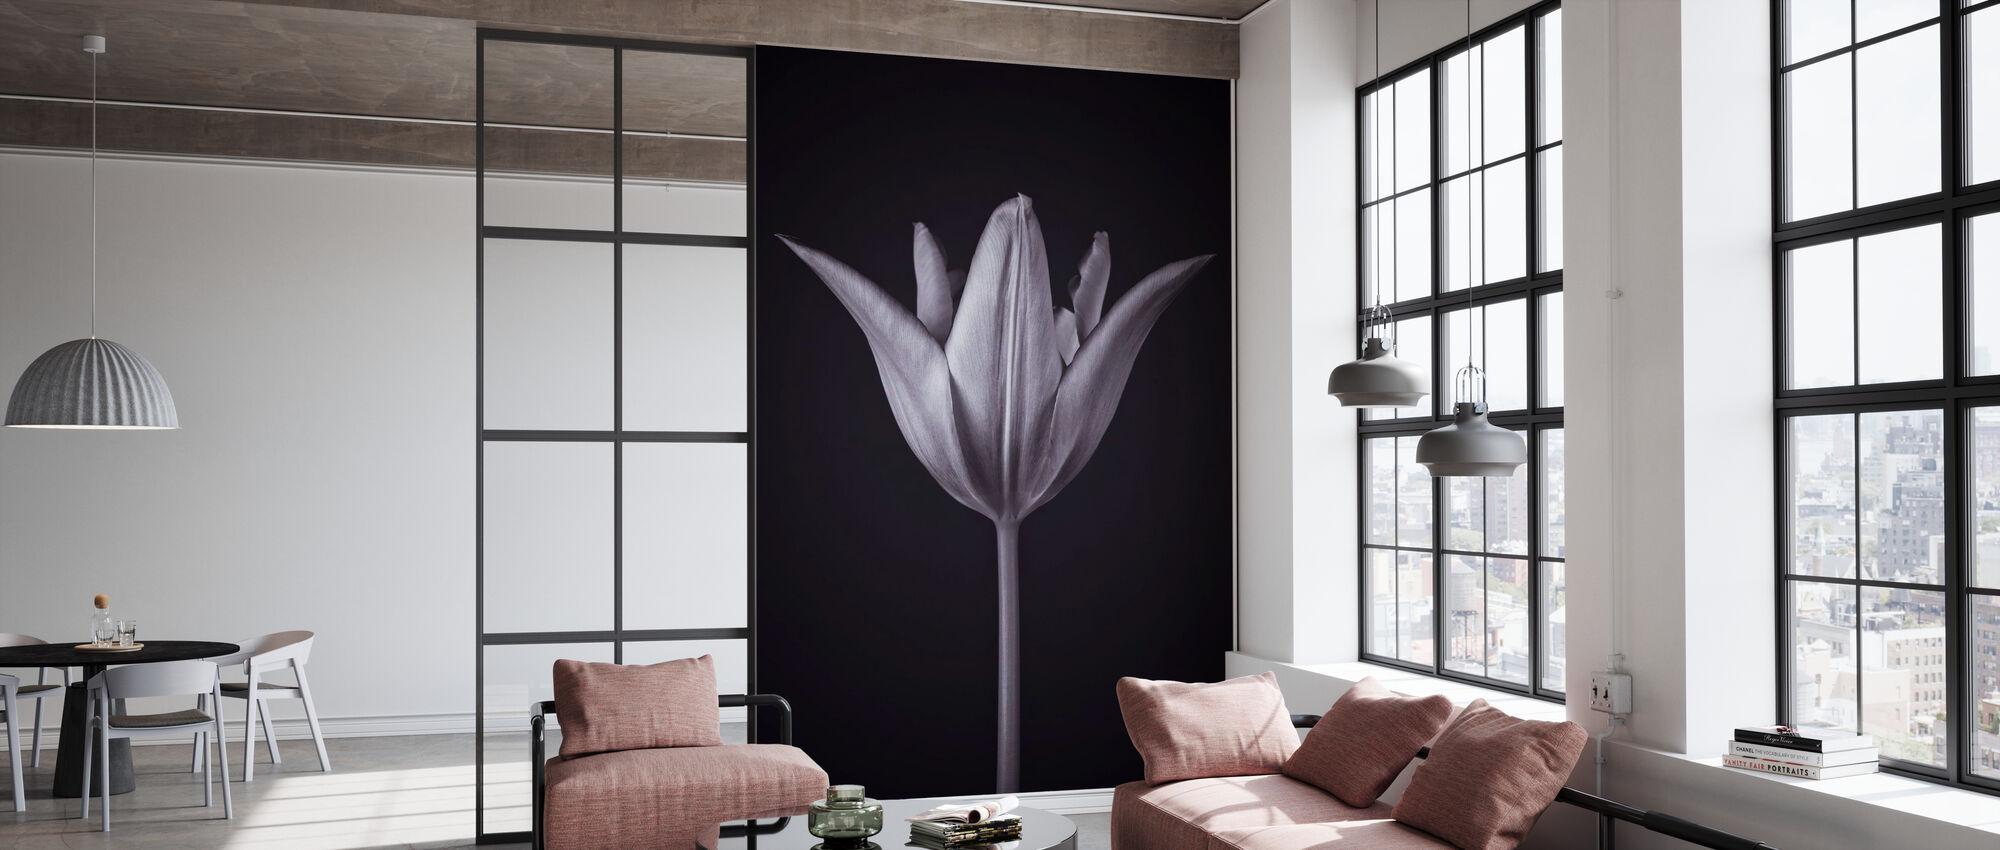 Single Tulip - Wallpaper - Office